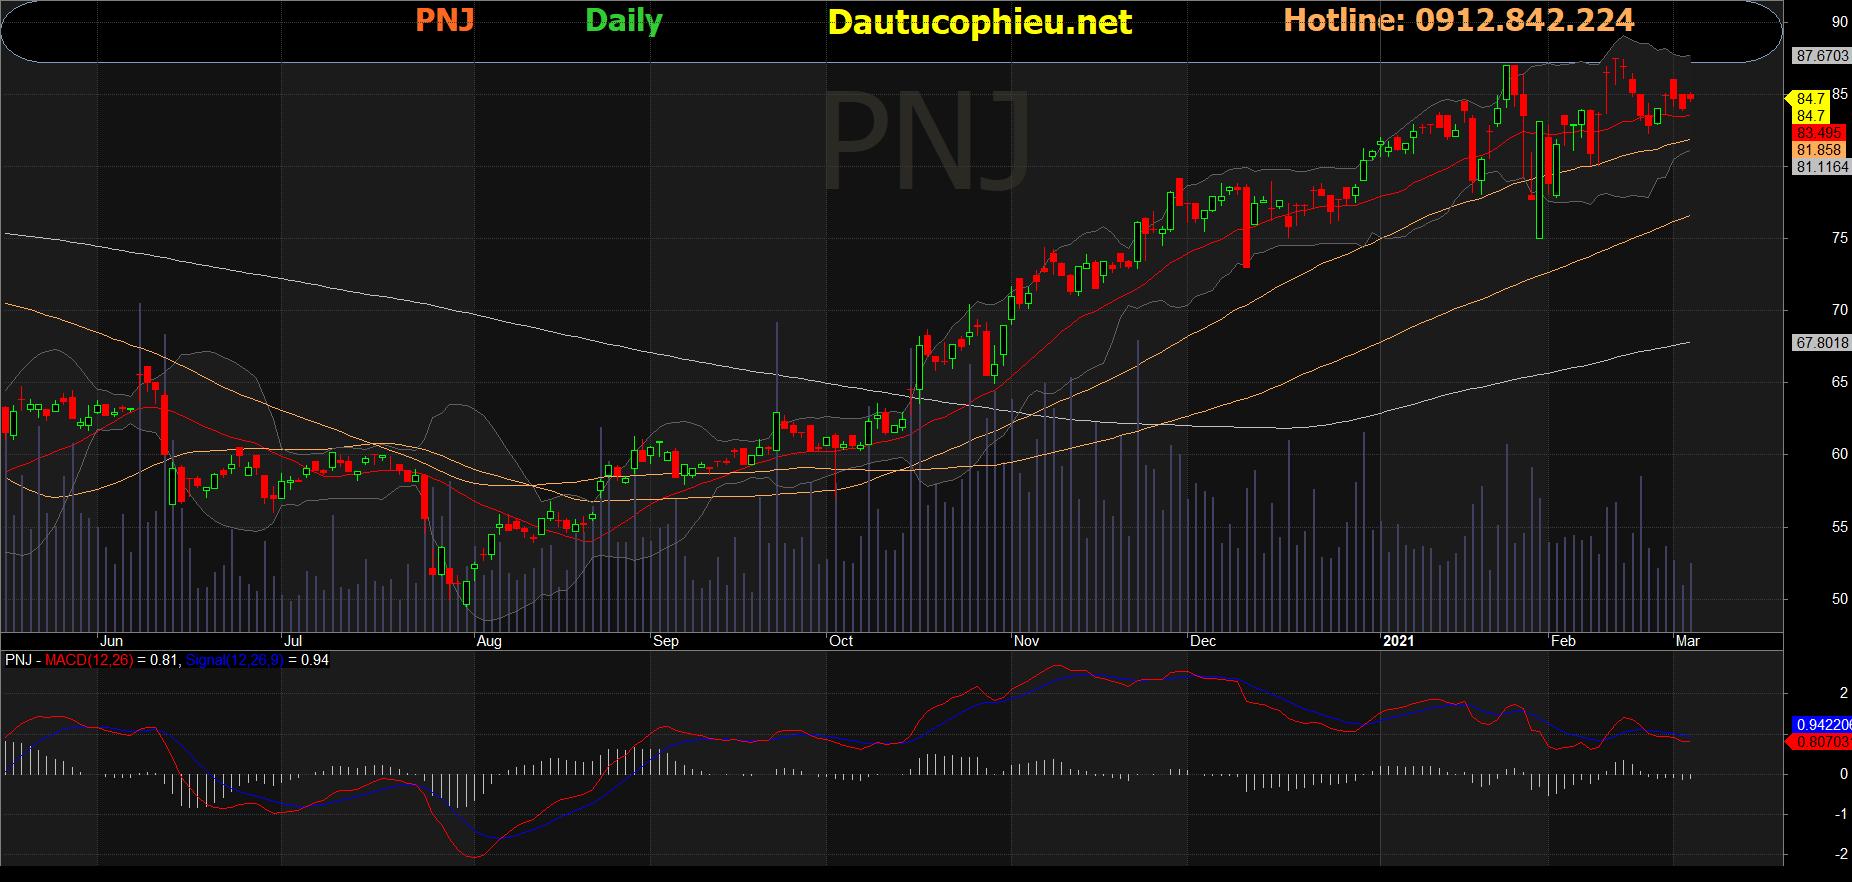 Cổ phiếu PNJ